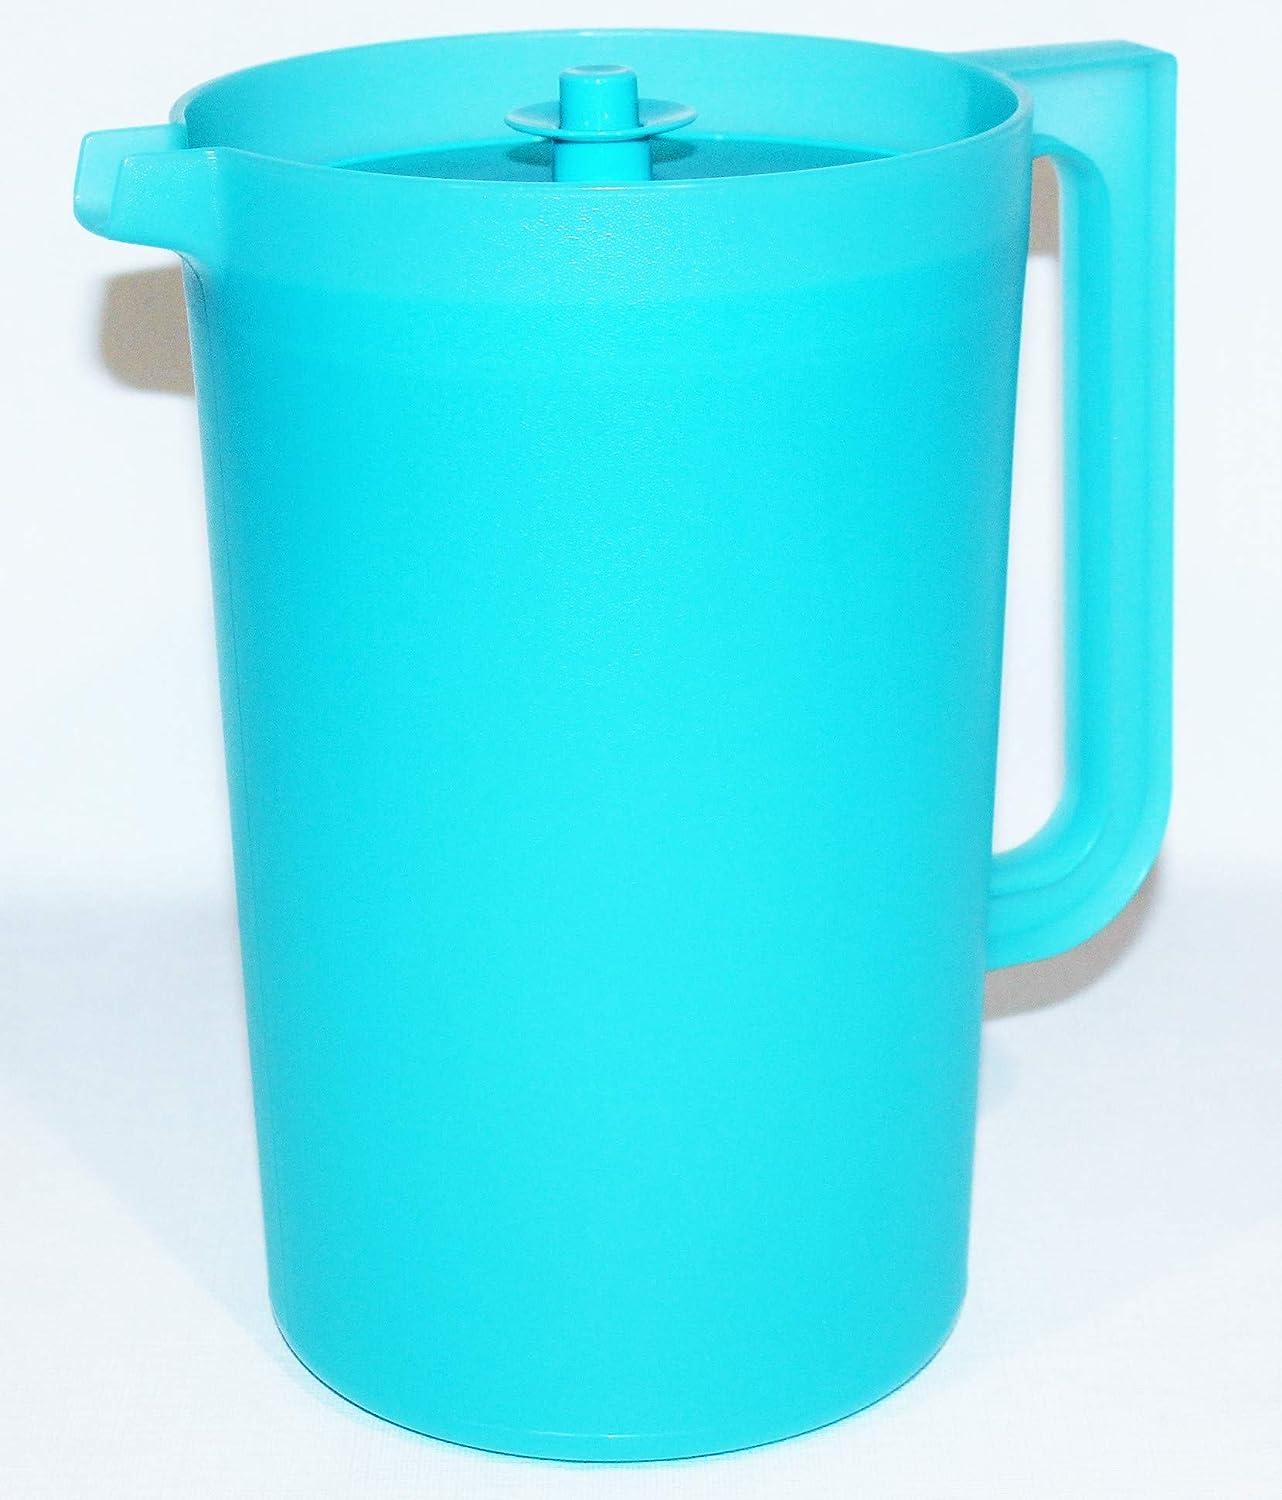 Tupperware Pitcher Classic Push-Button Style 1 Gallon Aqua Blue